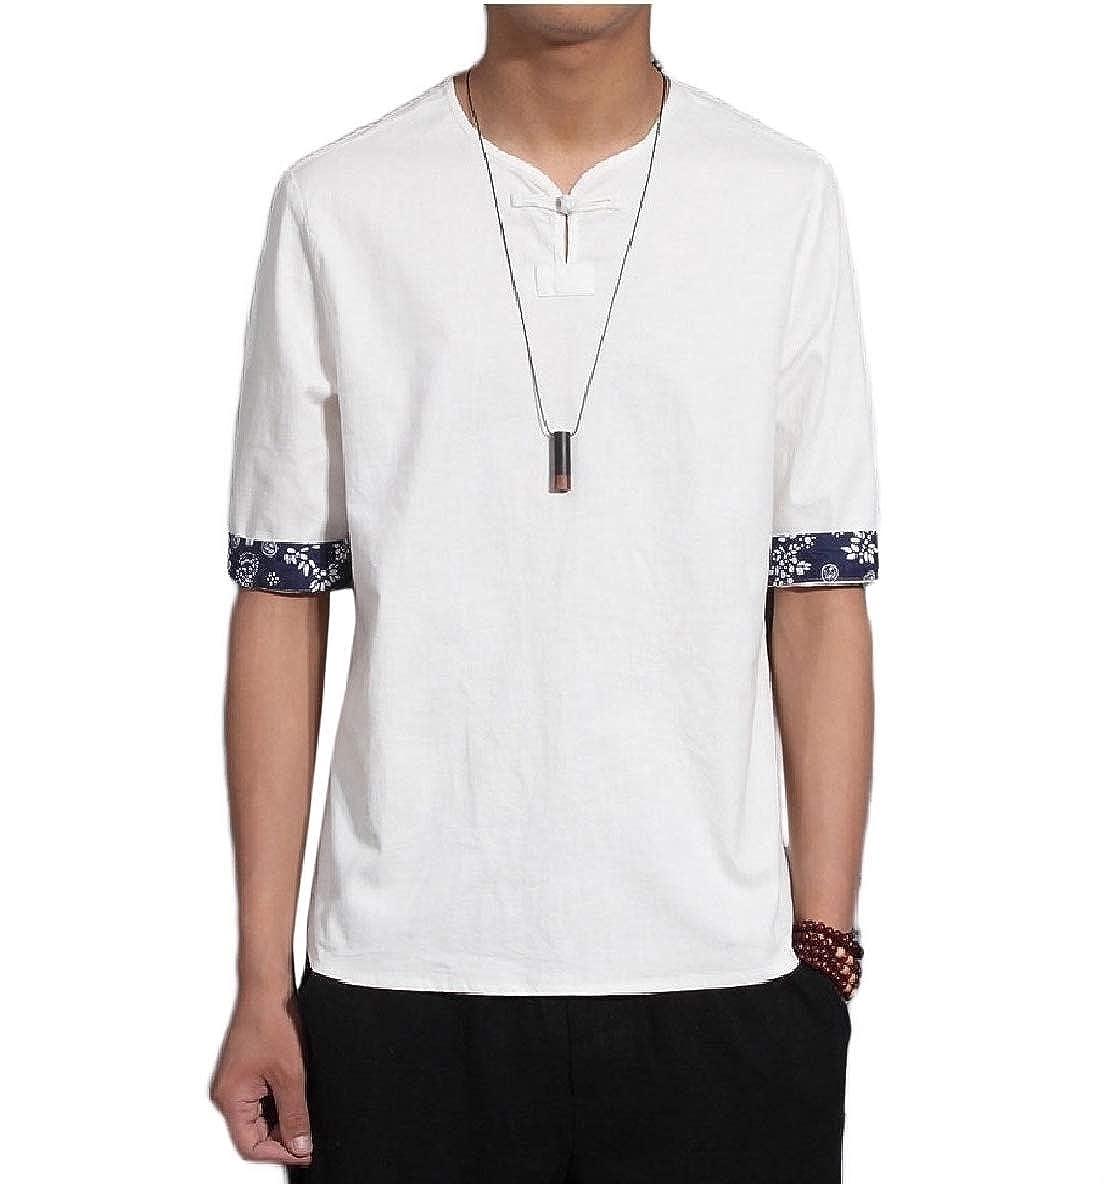 Winwinus Men Plus Size Chinese Style 3//4 Sleeve Linen Tees Shirt